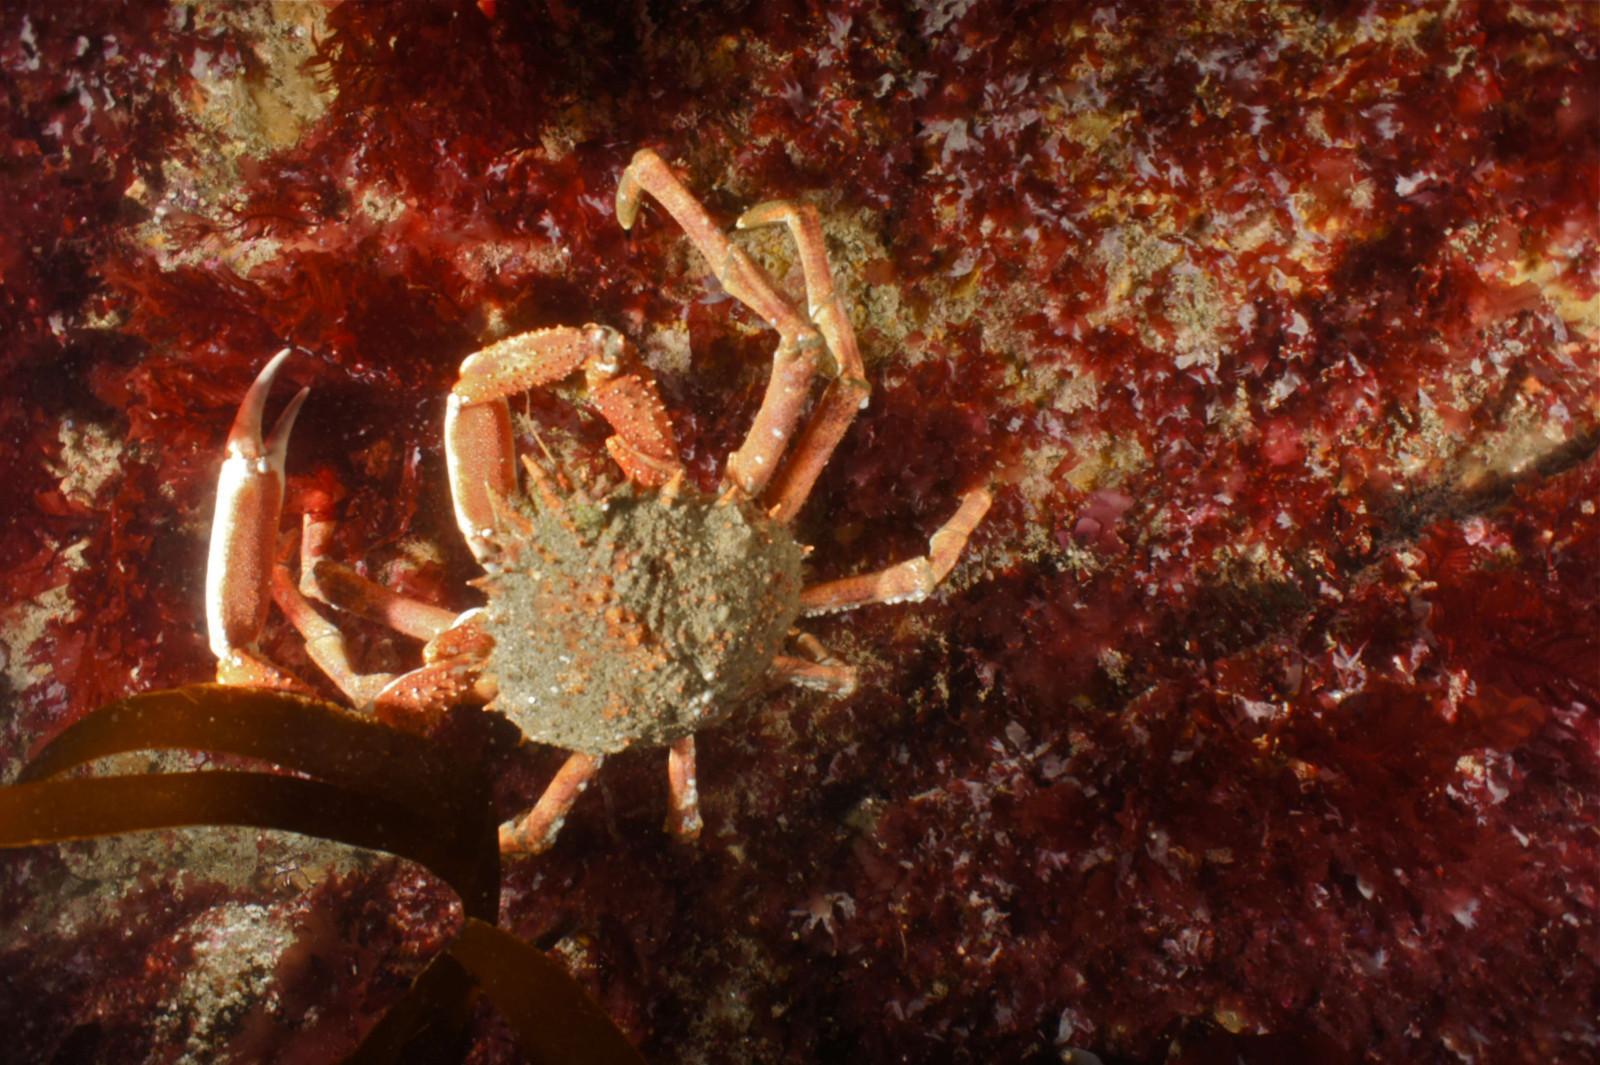 Scuba Dive at Drawna Rocks (3)